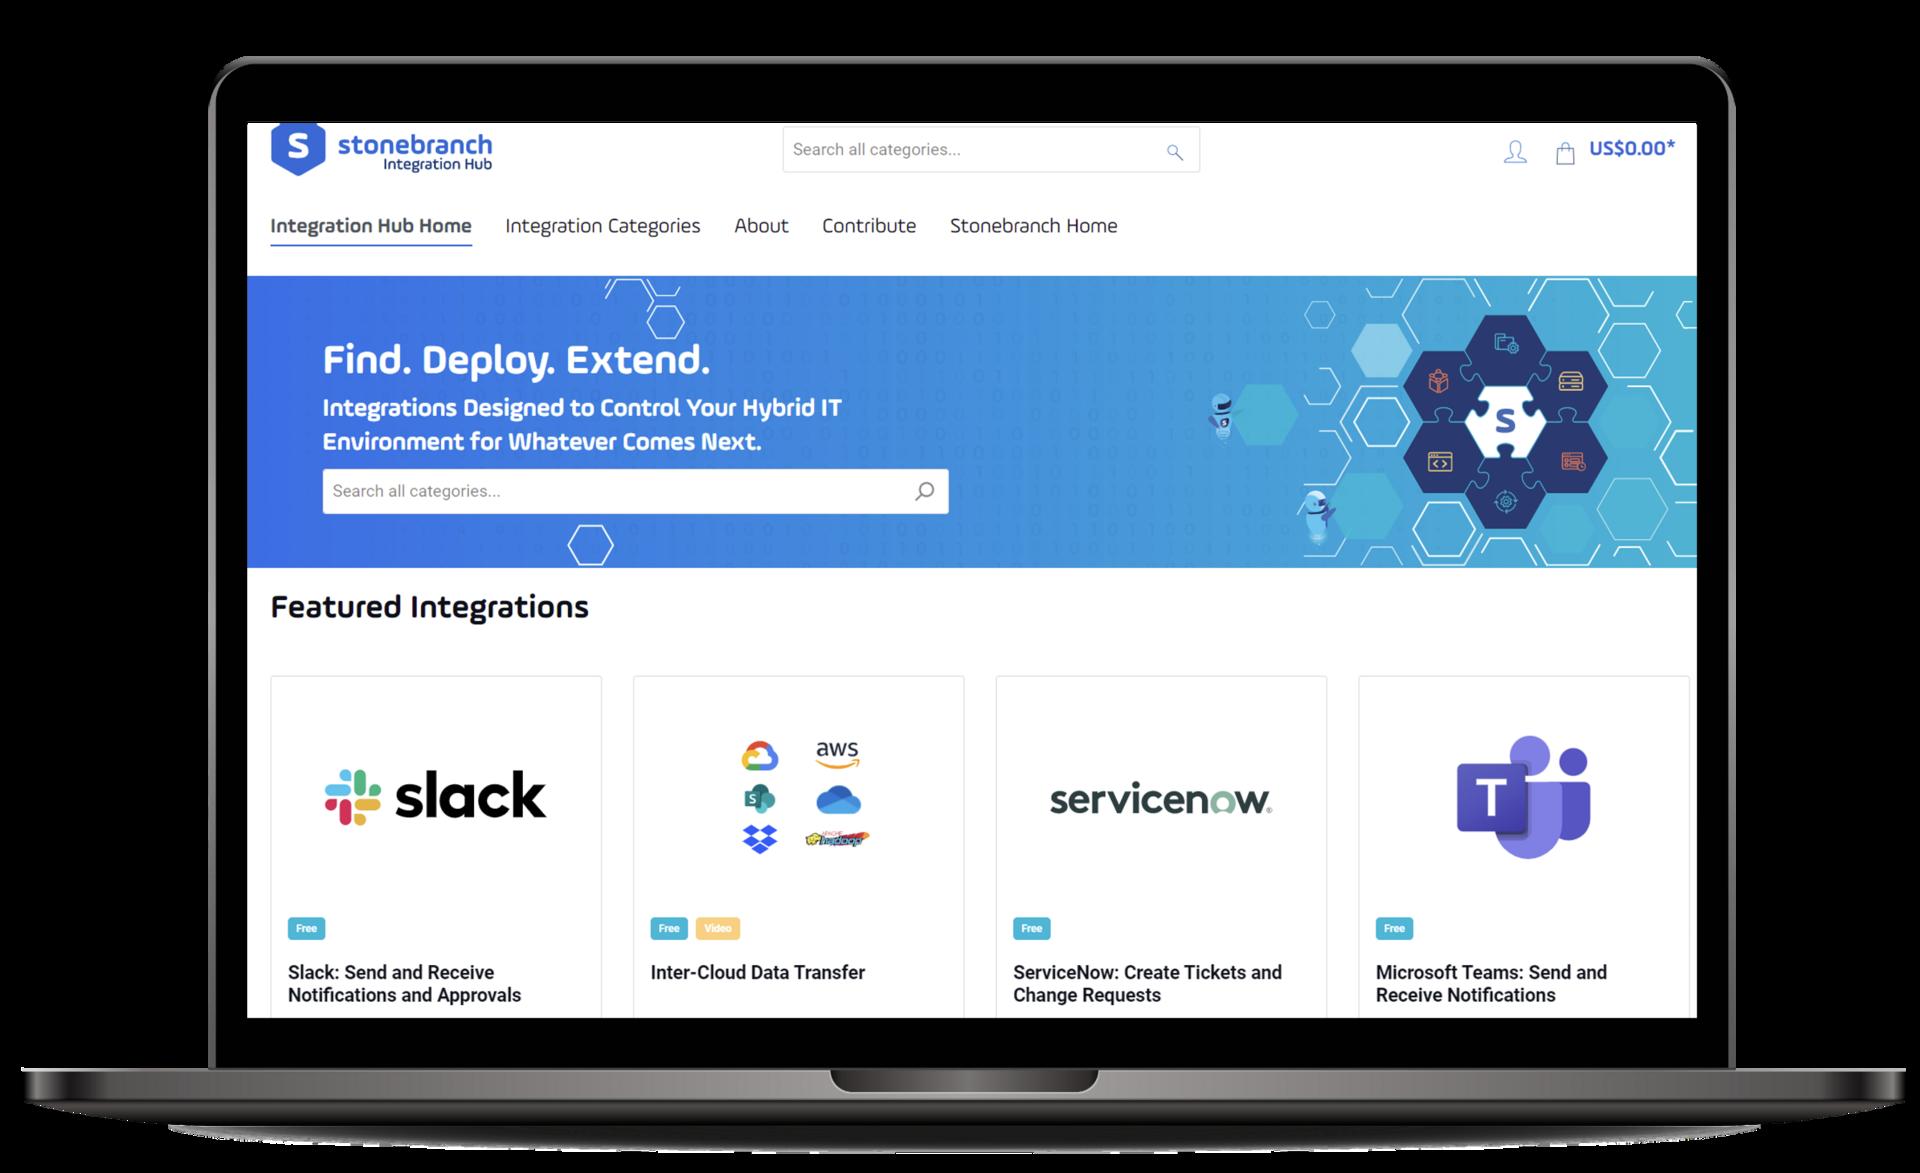 Stonebranch Integration Hub Home Page